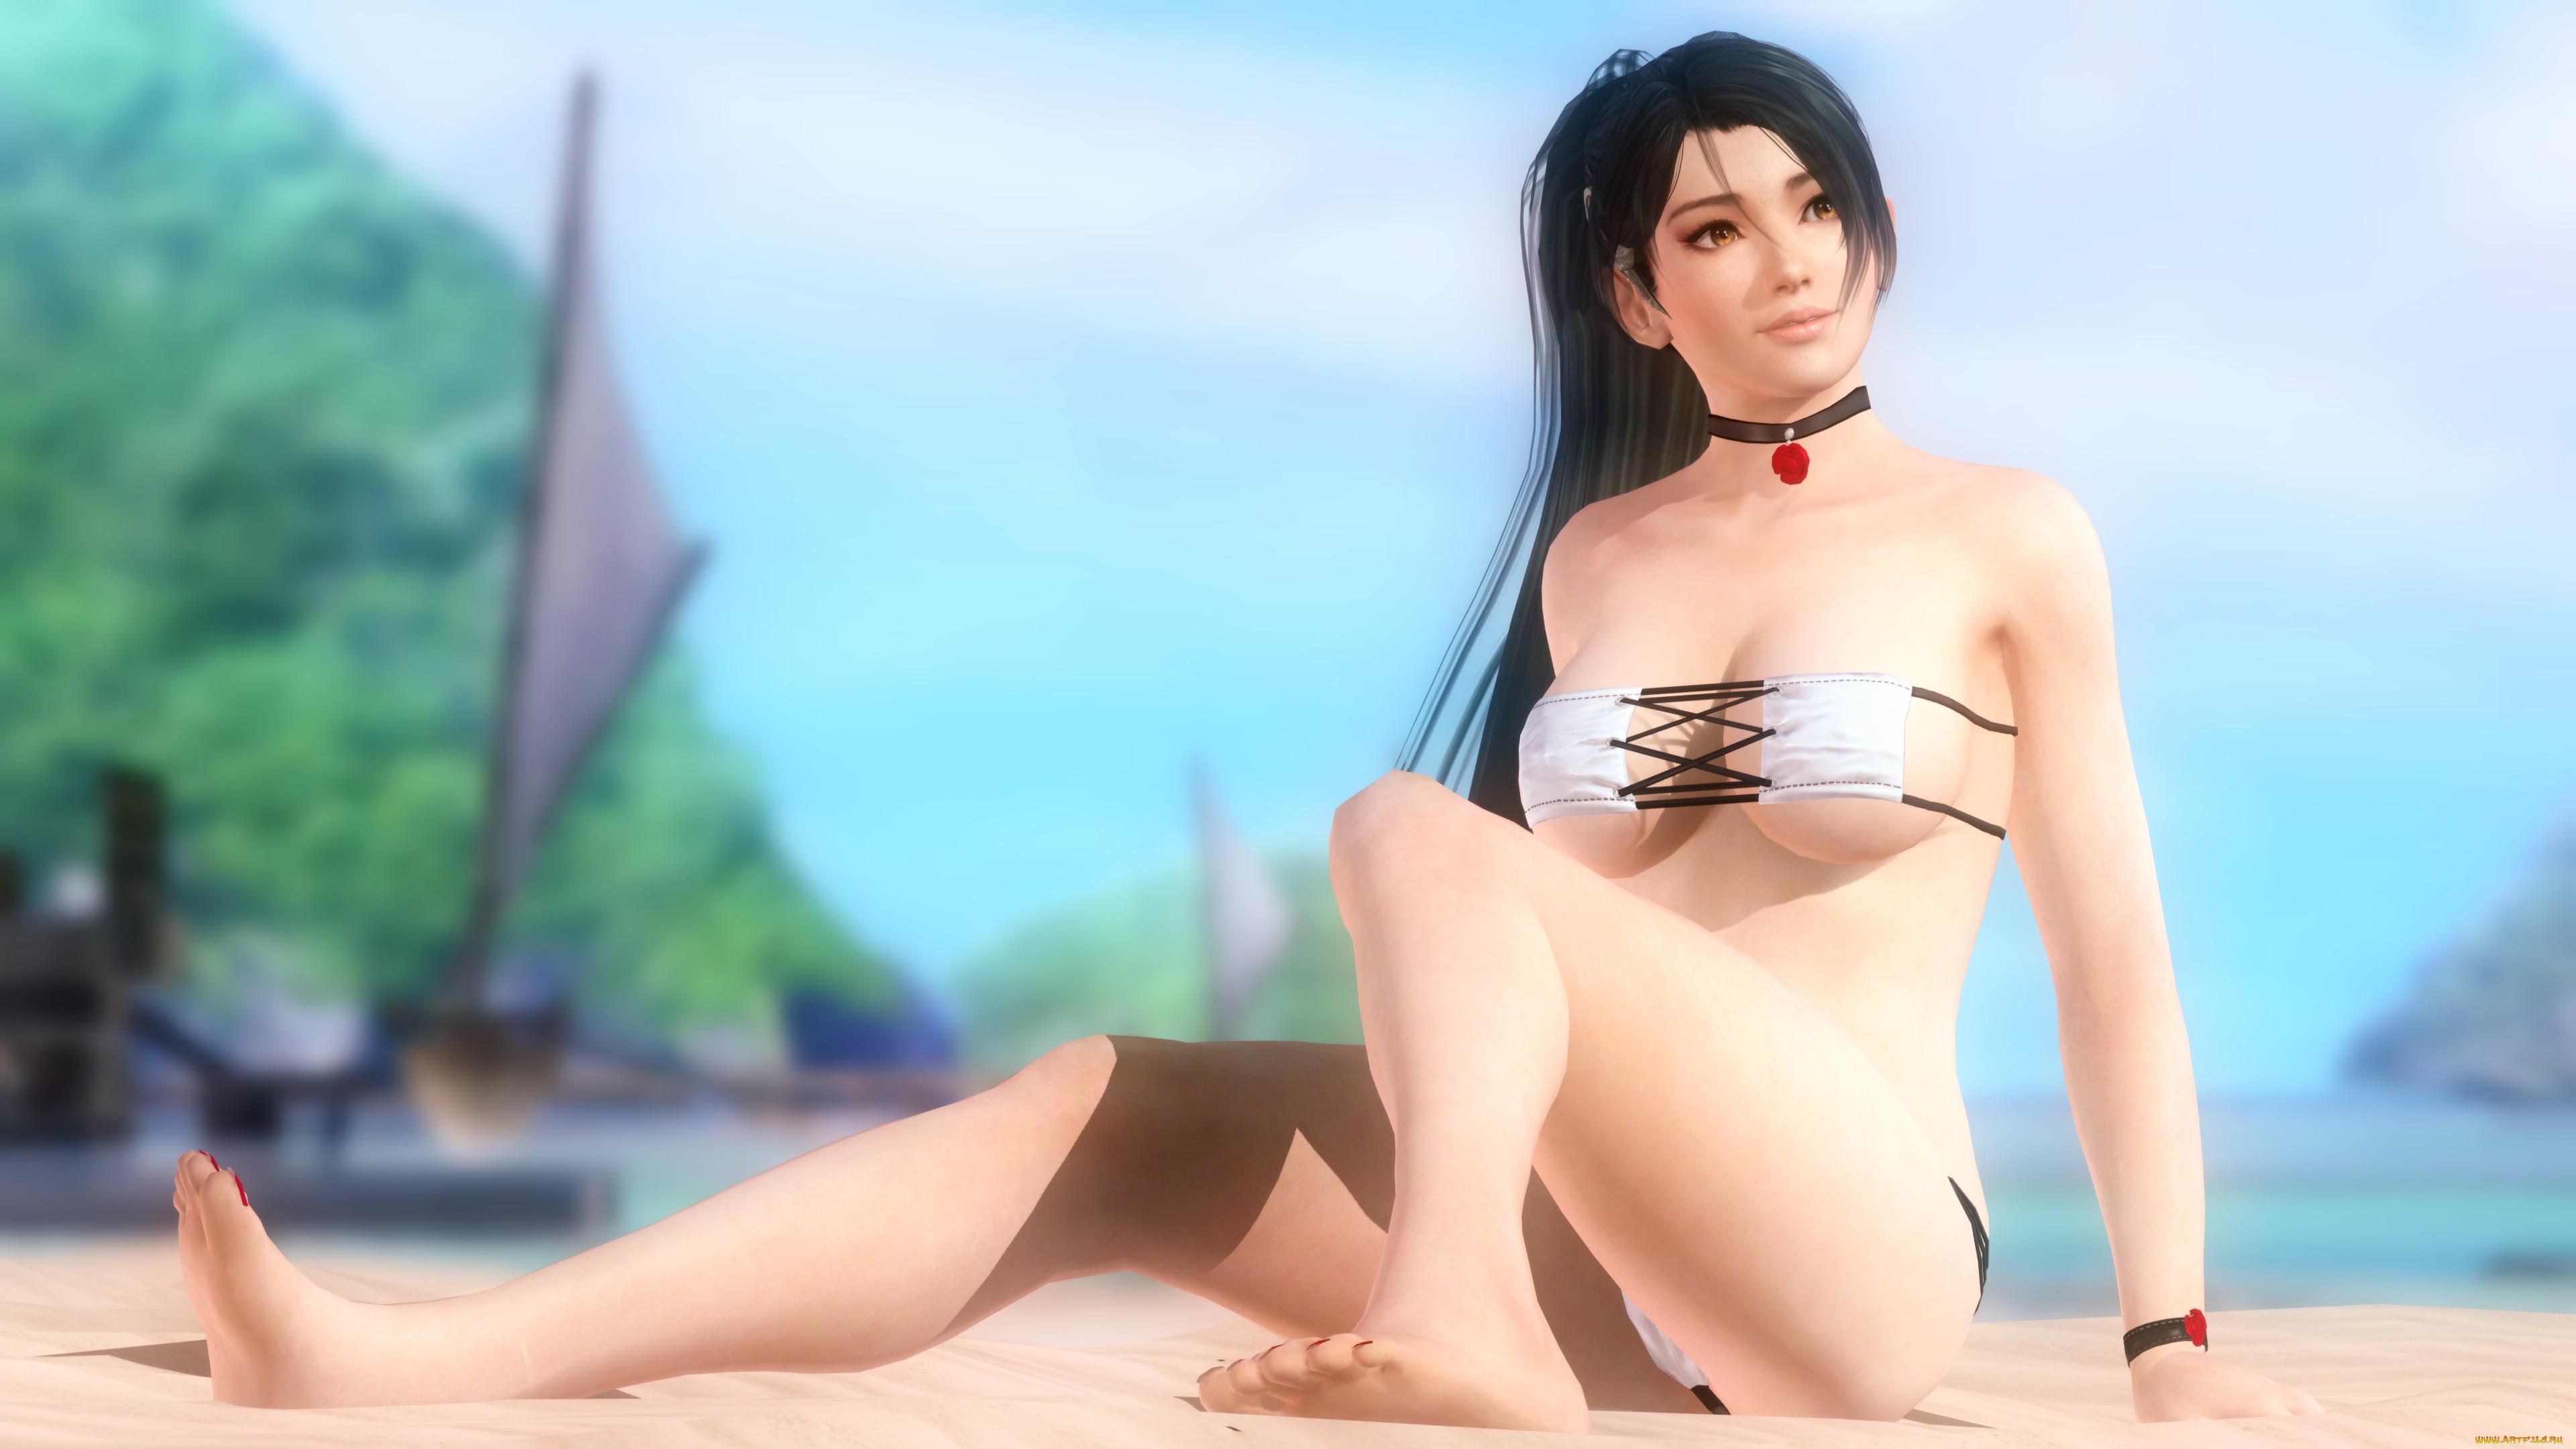 Hot skinny brunette nude